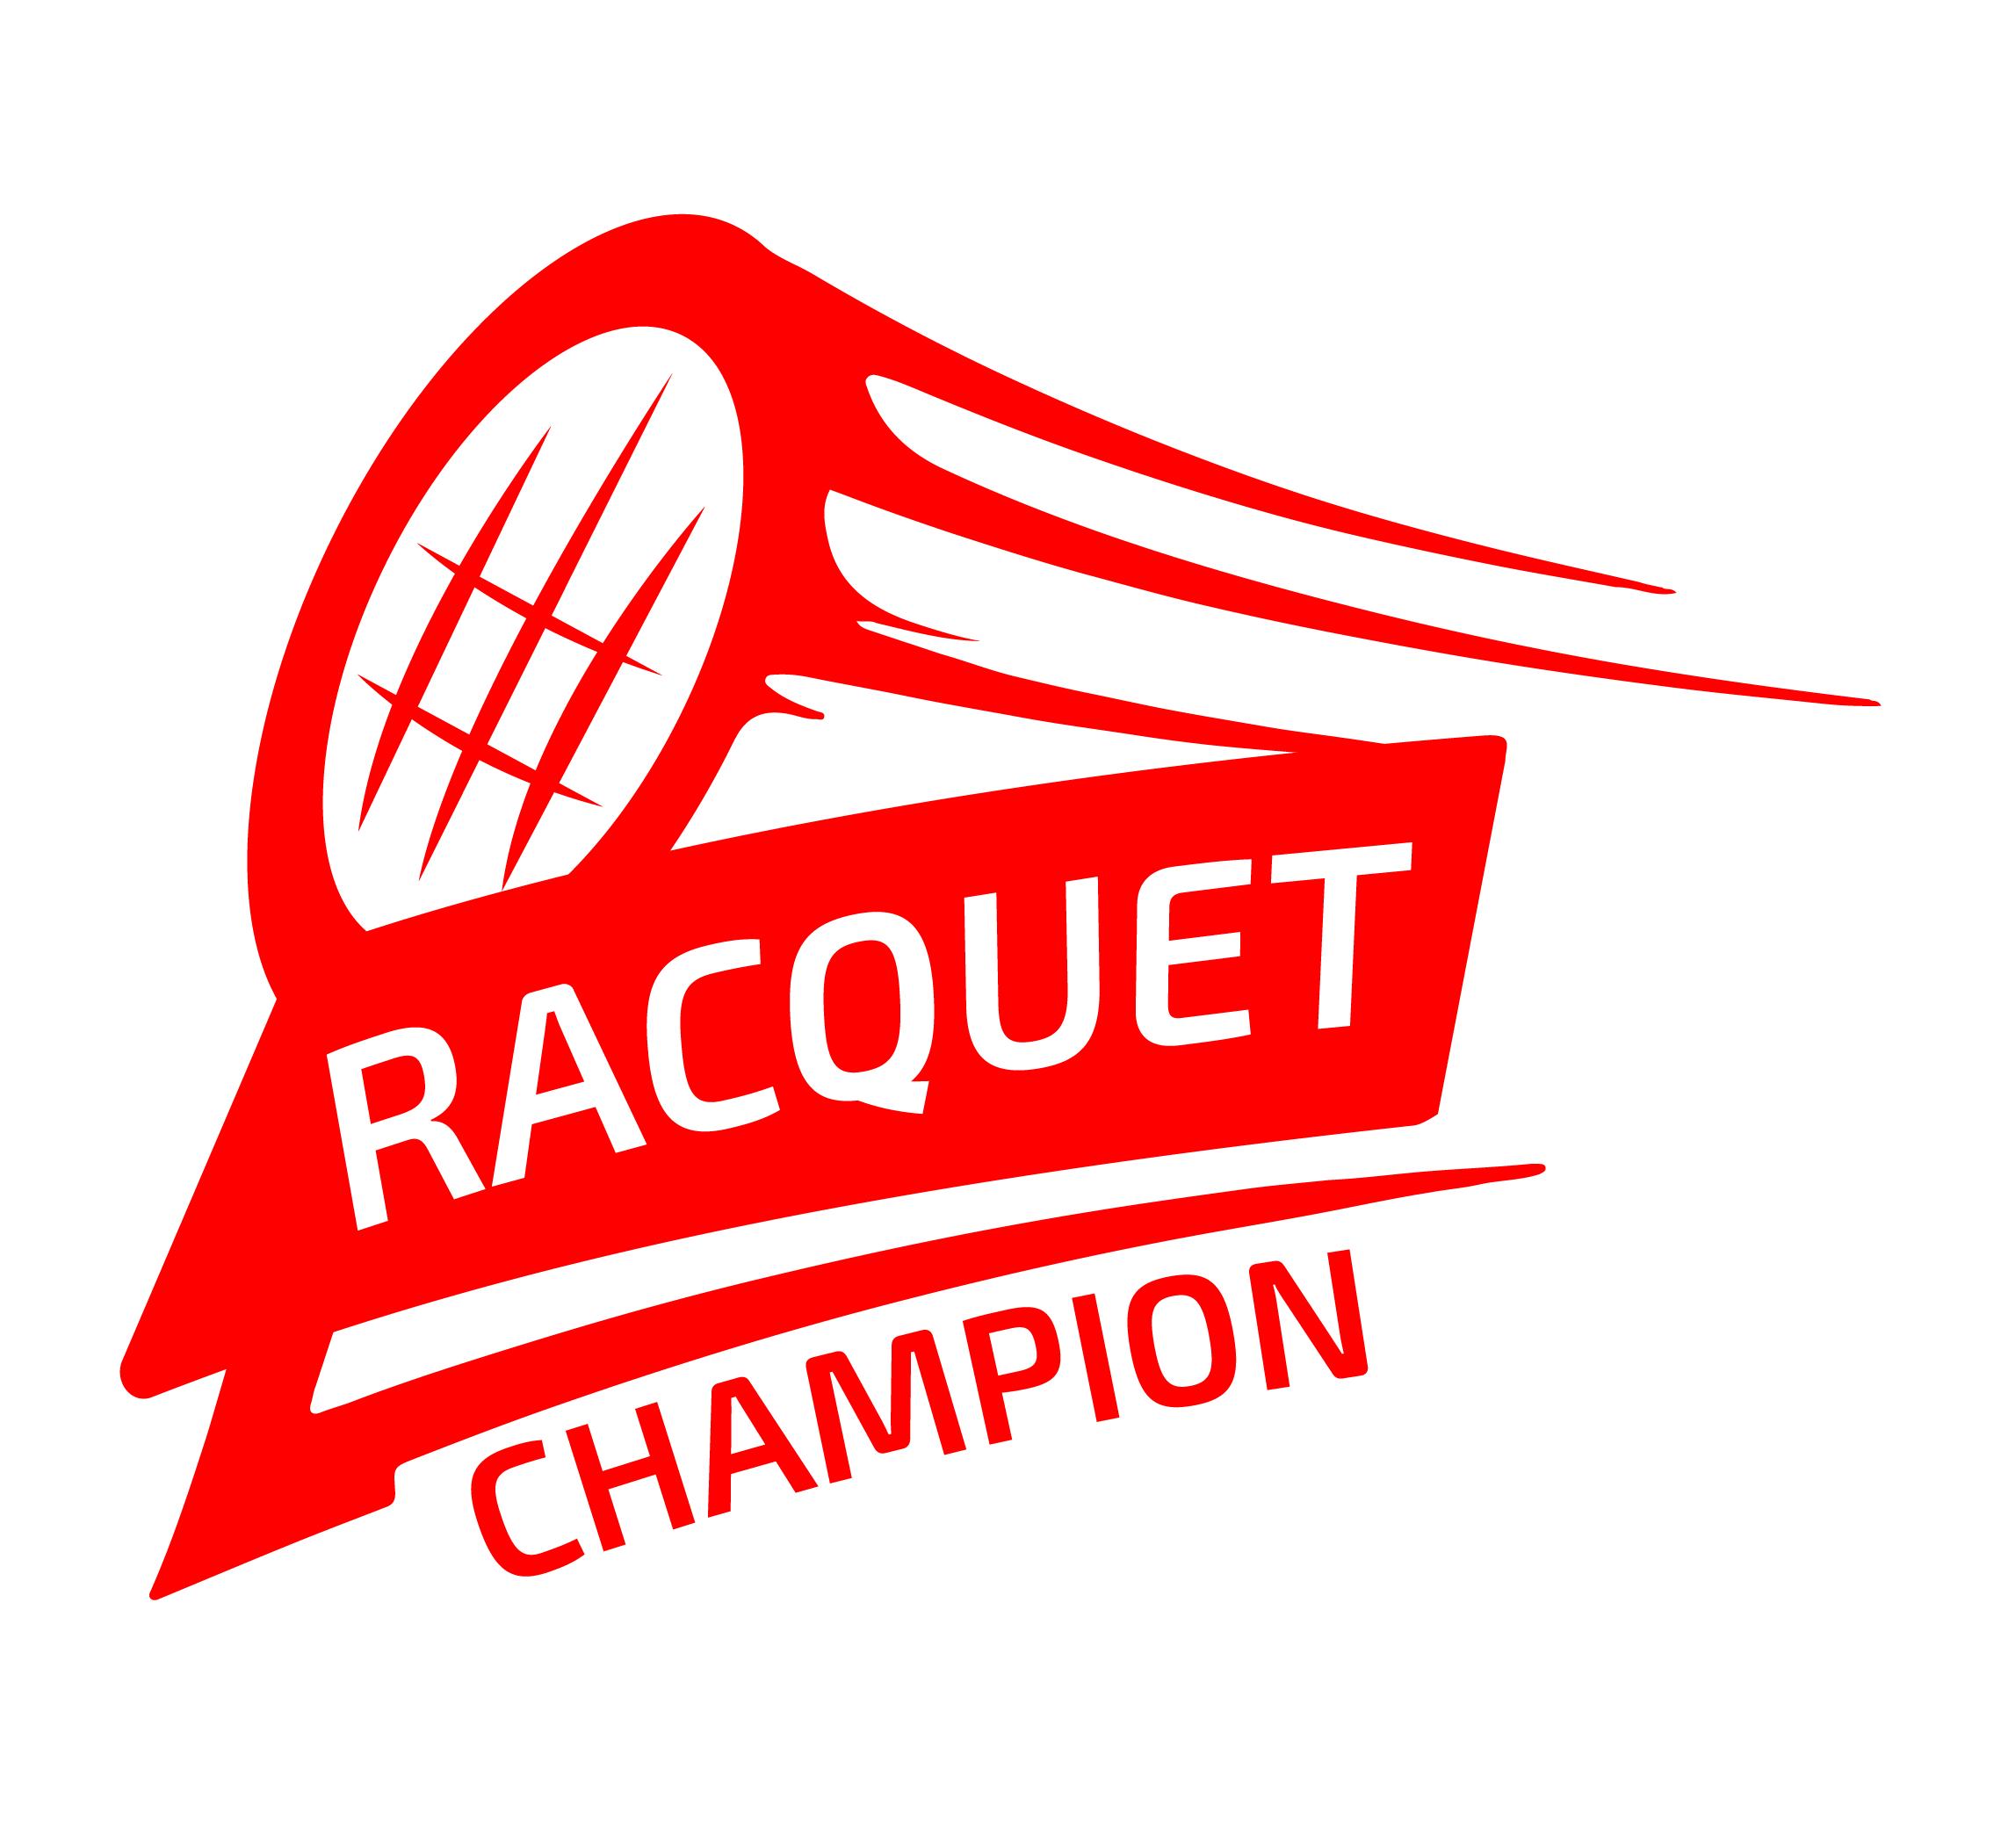 Racquet Champion